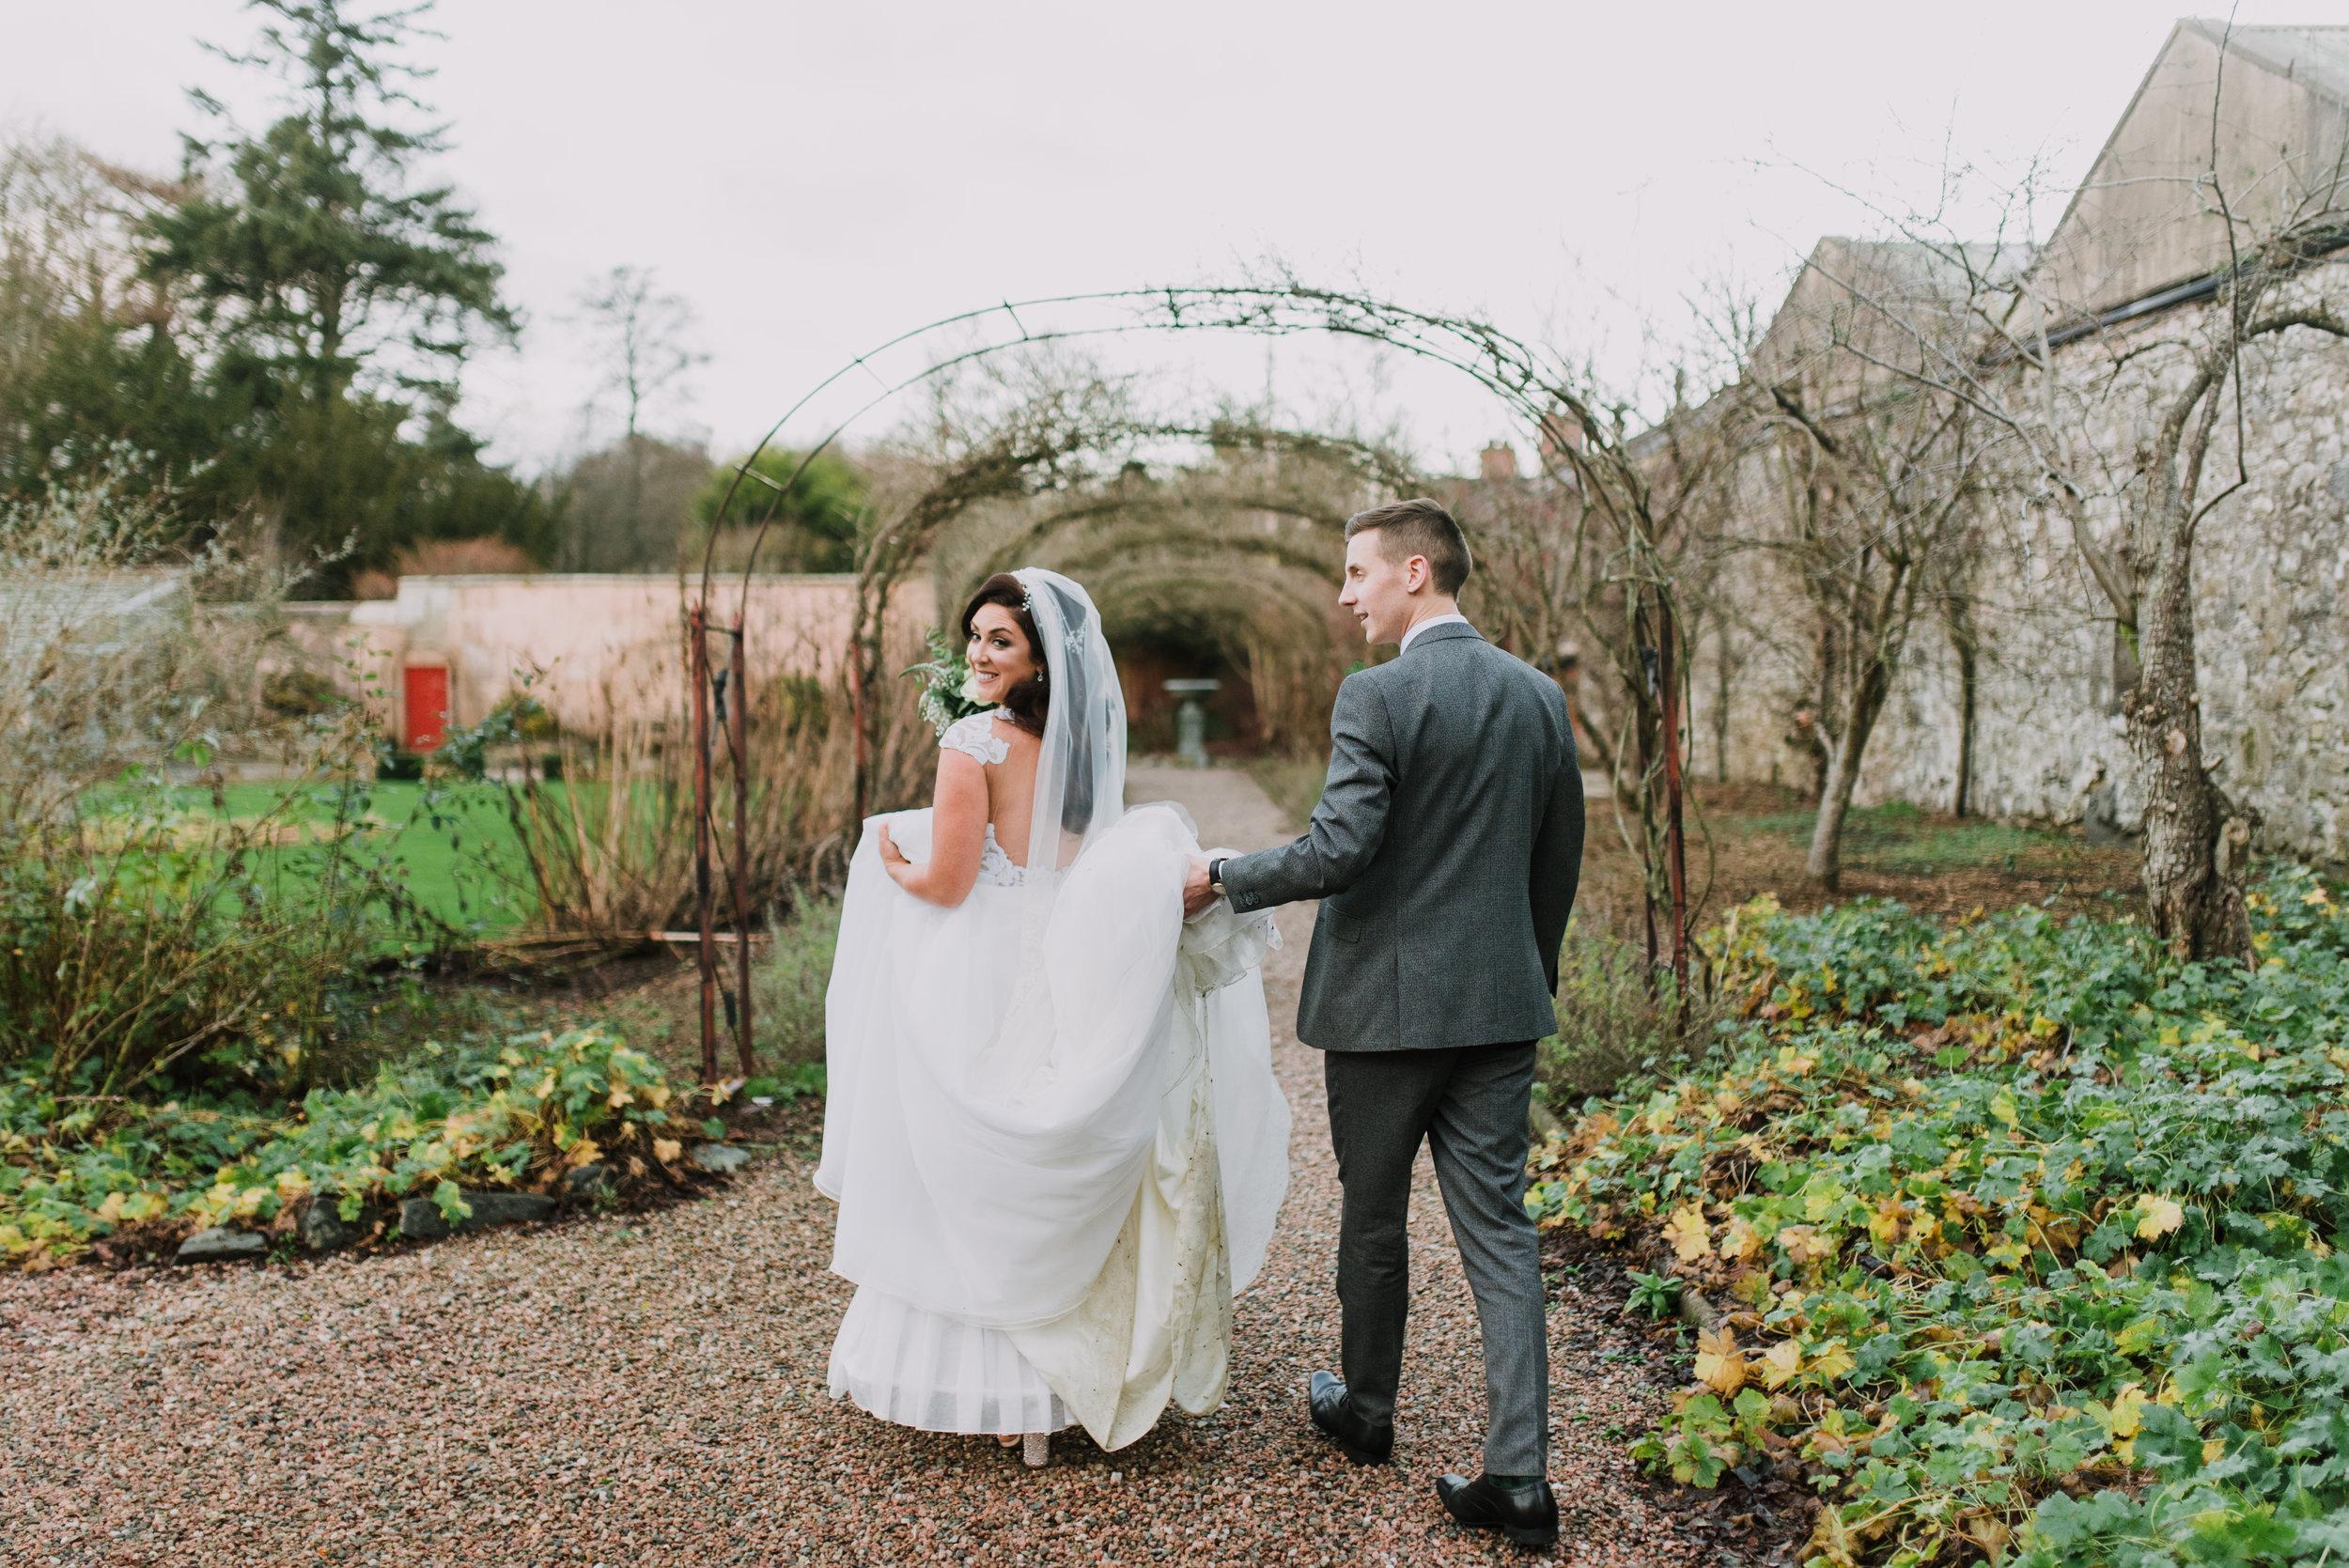 larchfield estate wedding, wedding venues northern ireland, barn wedding venues northern ireland, quirky weddings ni, wedding photos larchfield estate, shane todd's wedding (5).jpg